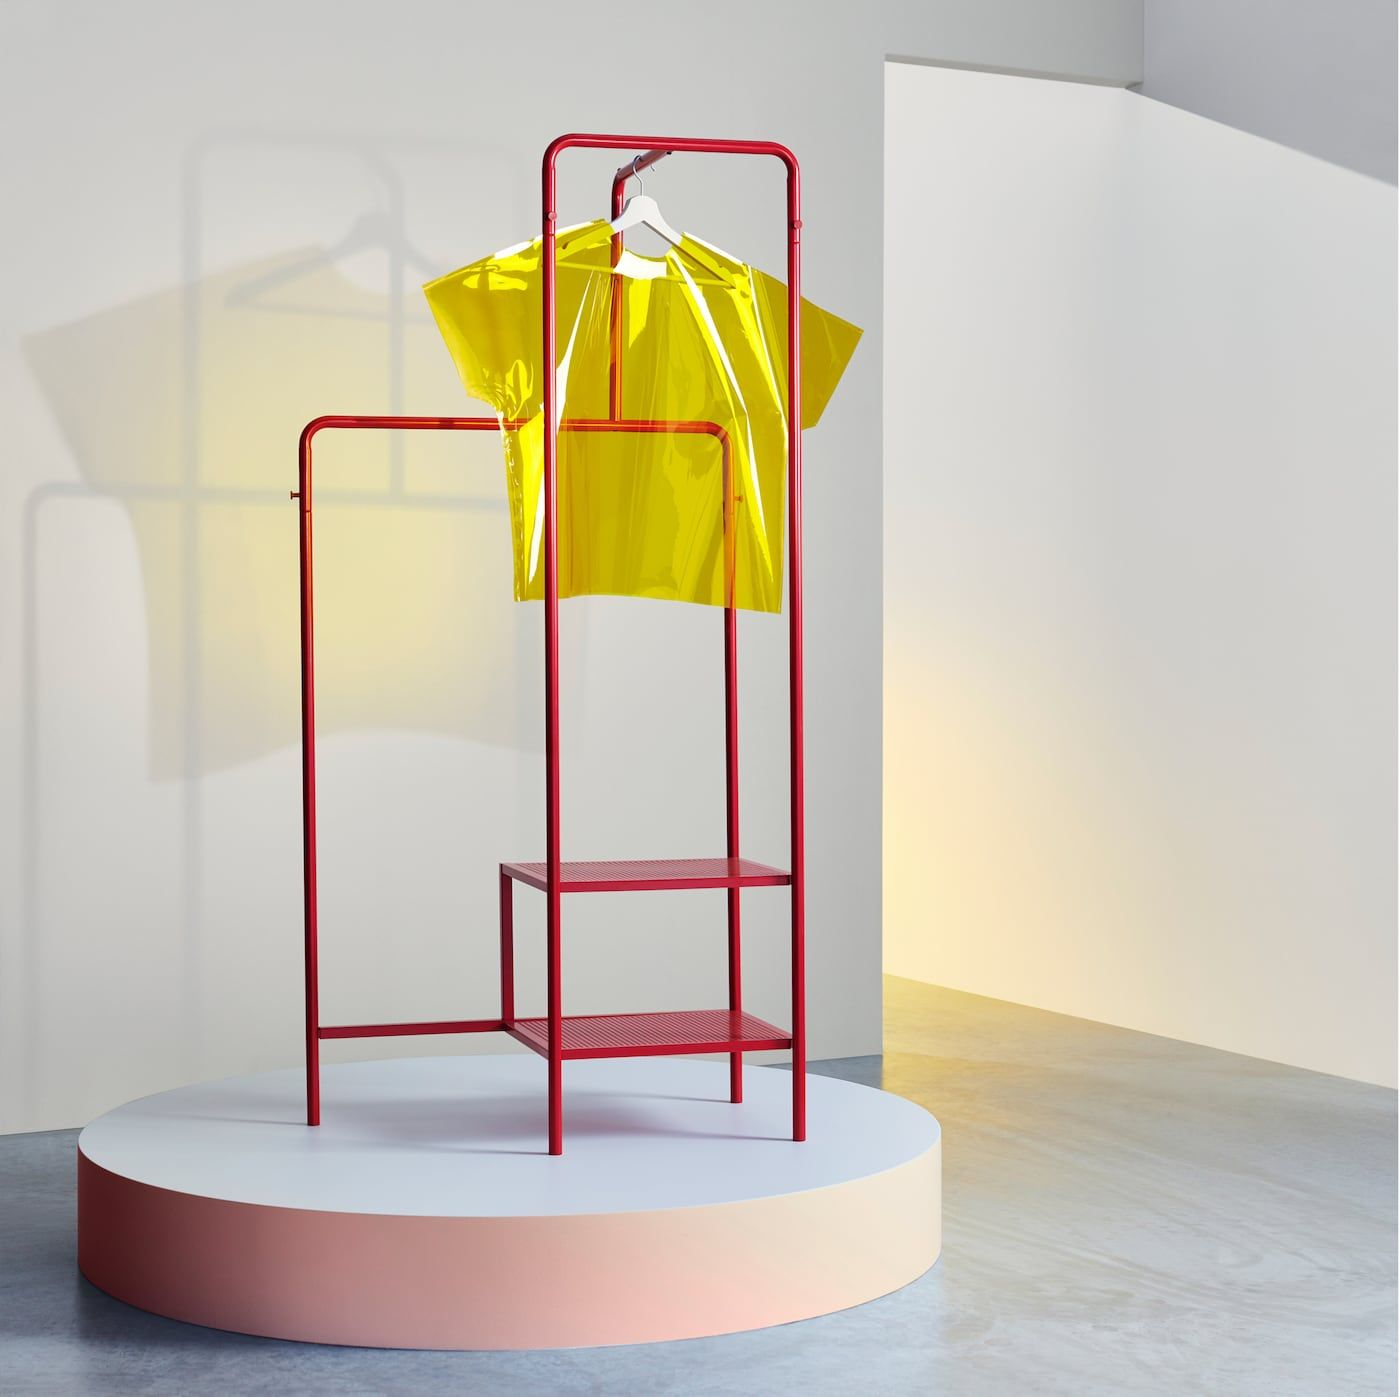 Nikkeby Garderobentander Kommode Im Industrial Stil Ikea Ideen